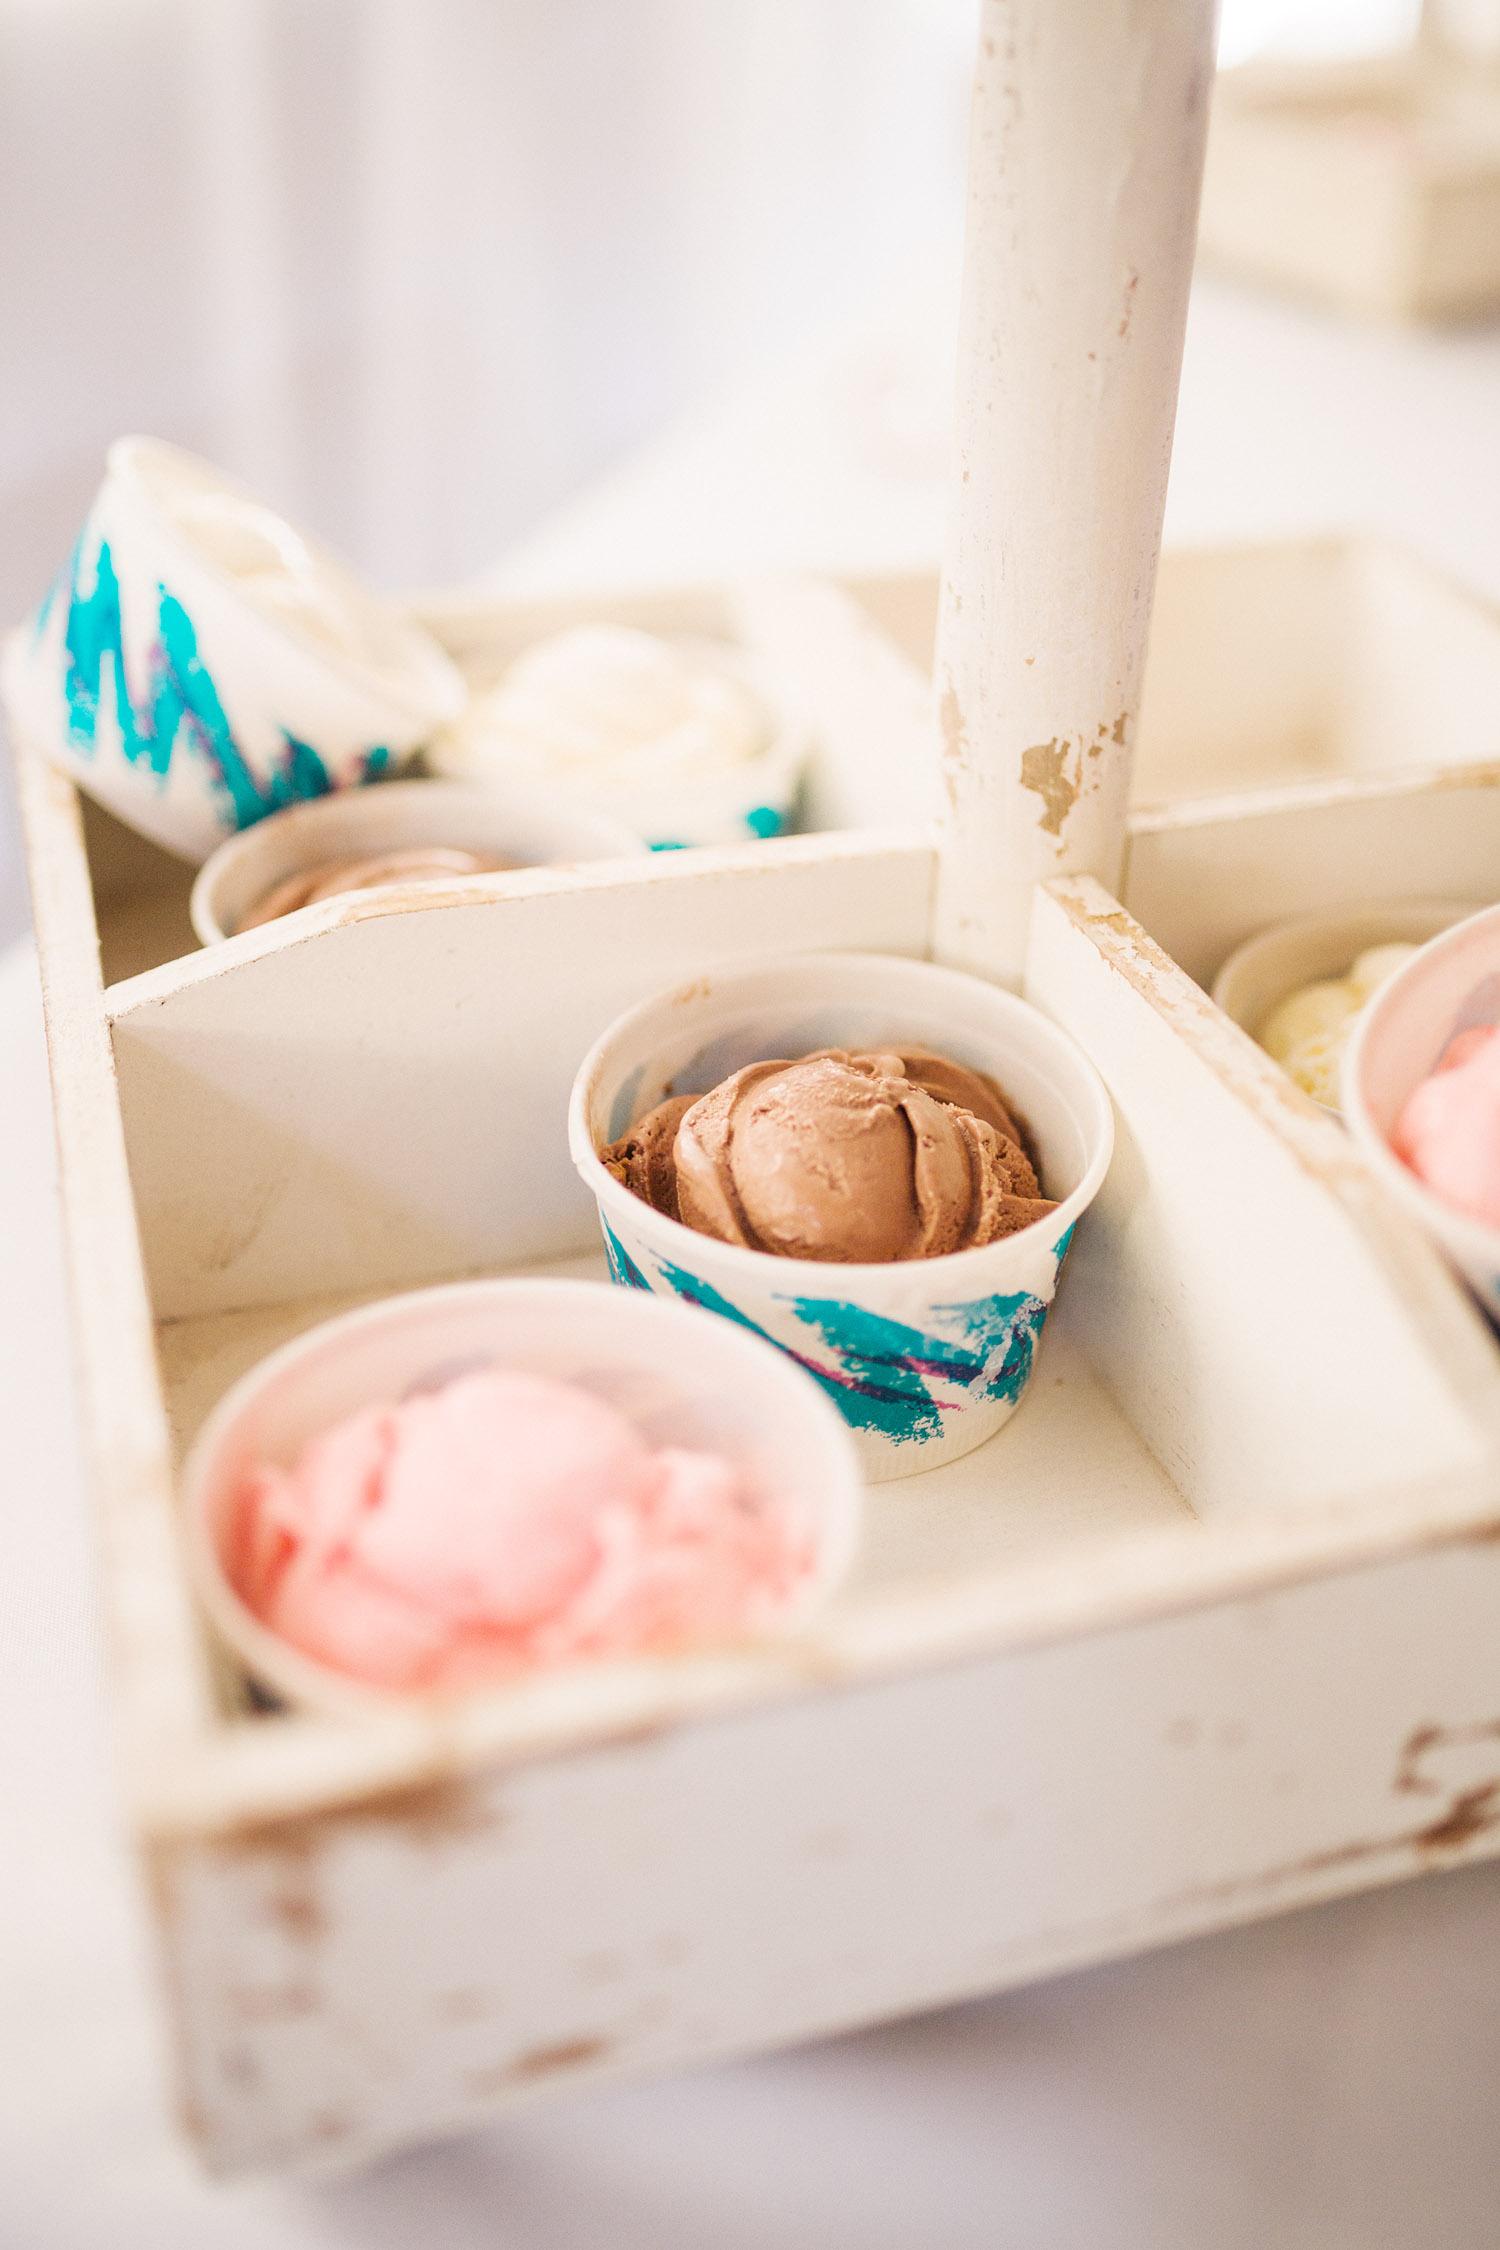 Outdoor Wedding reception ideas - Ice Cream